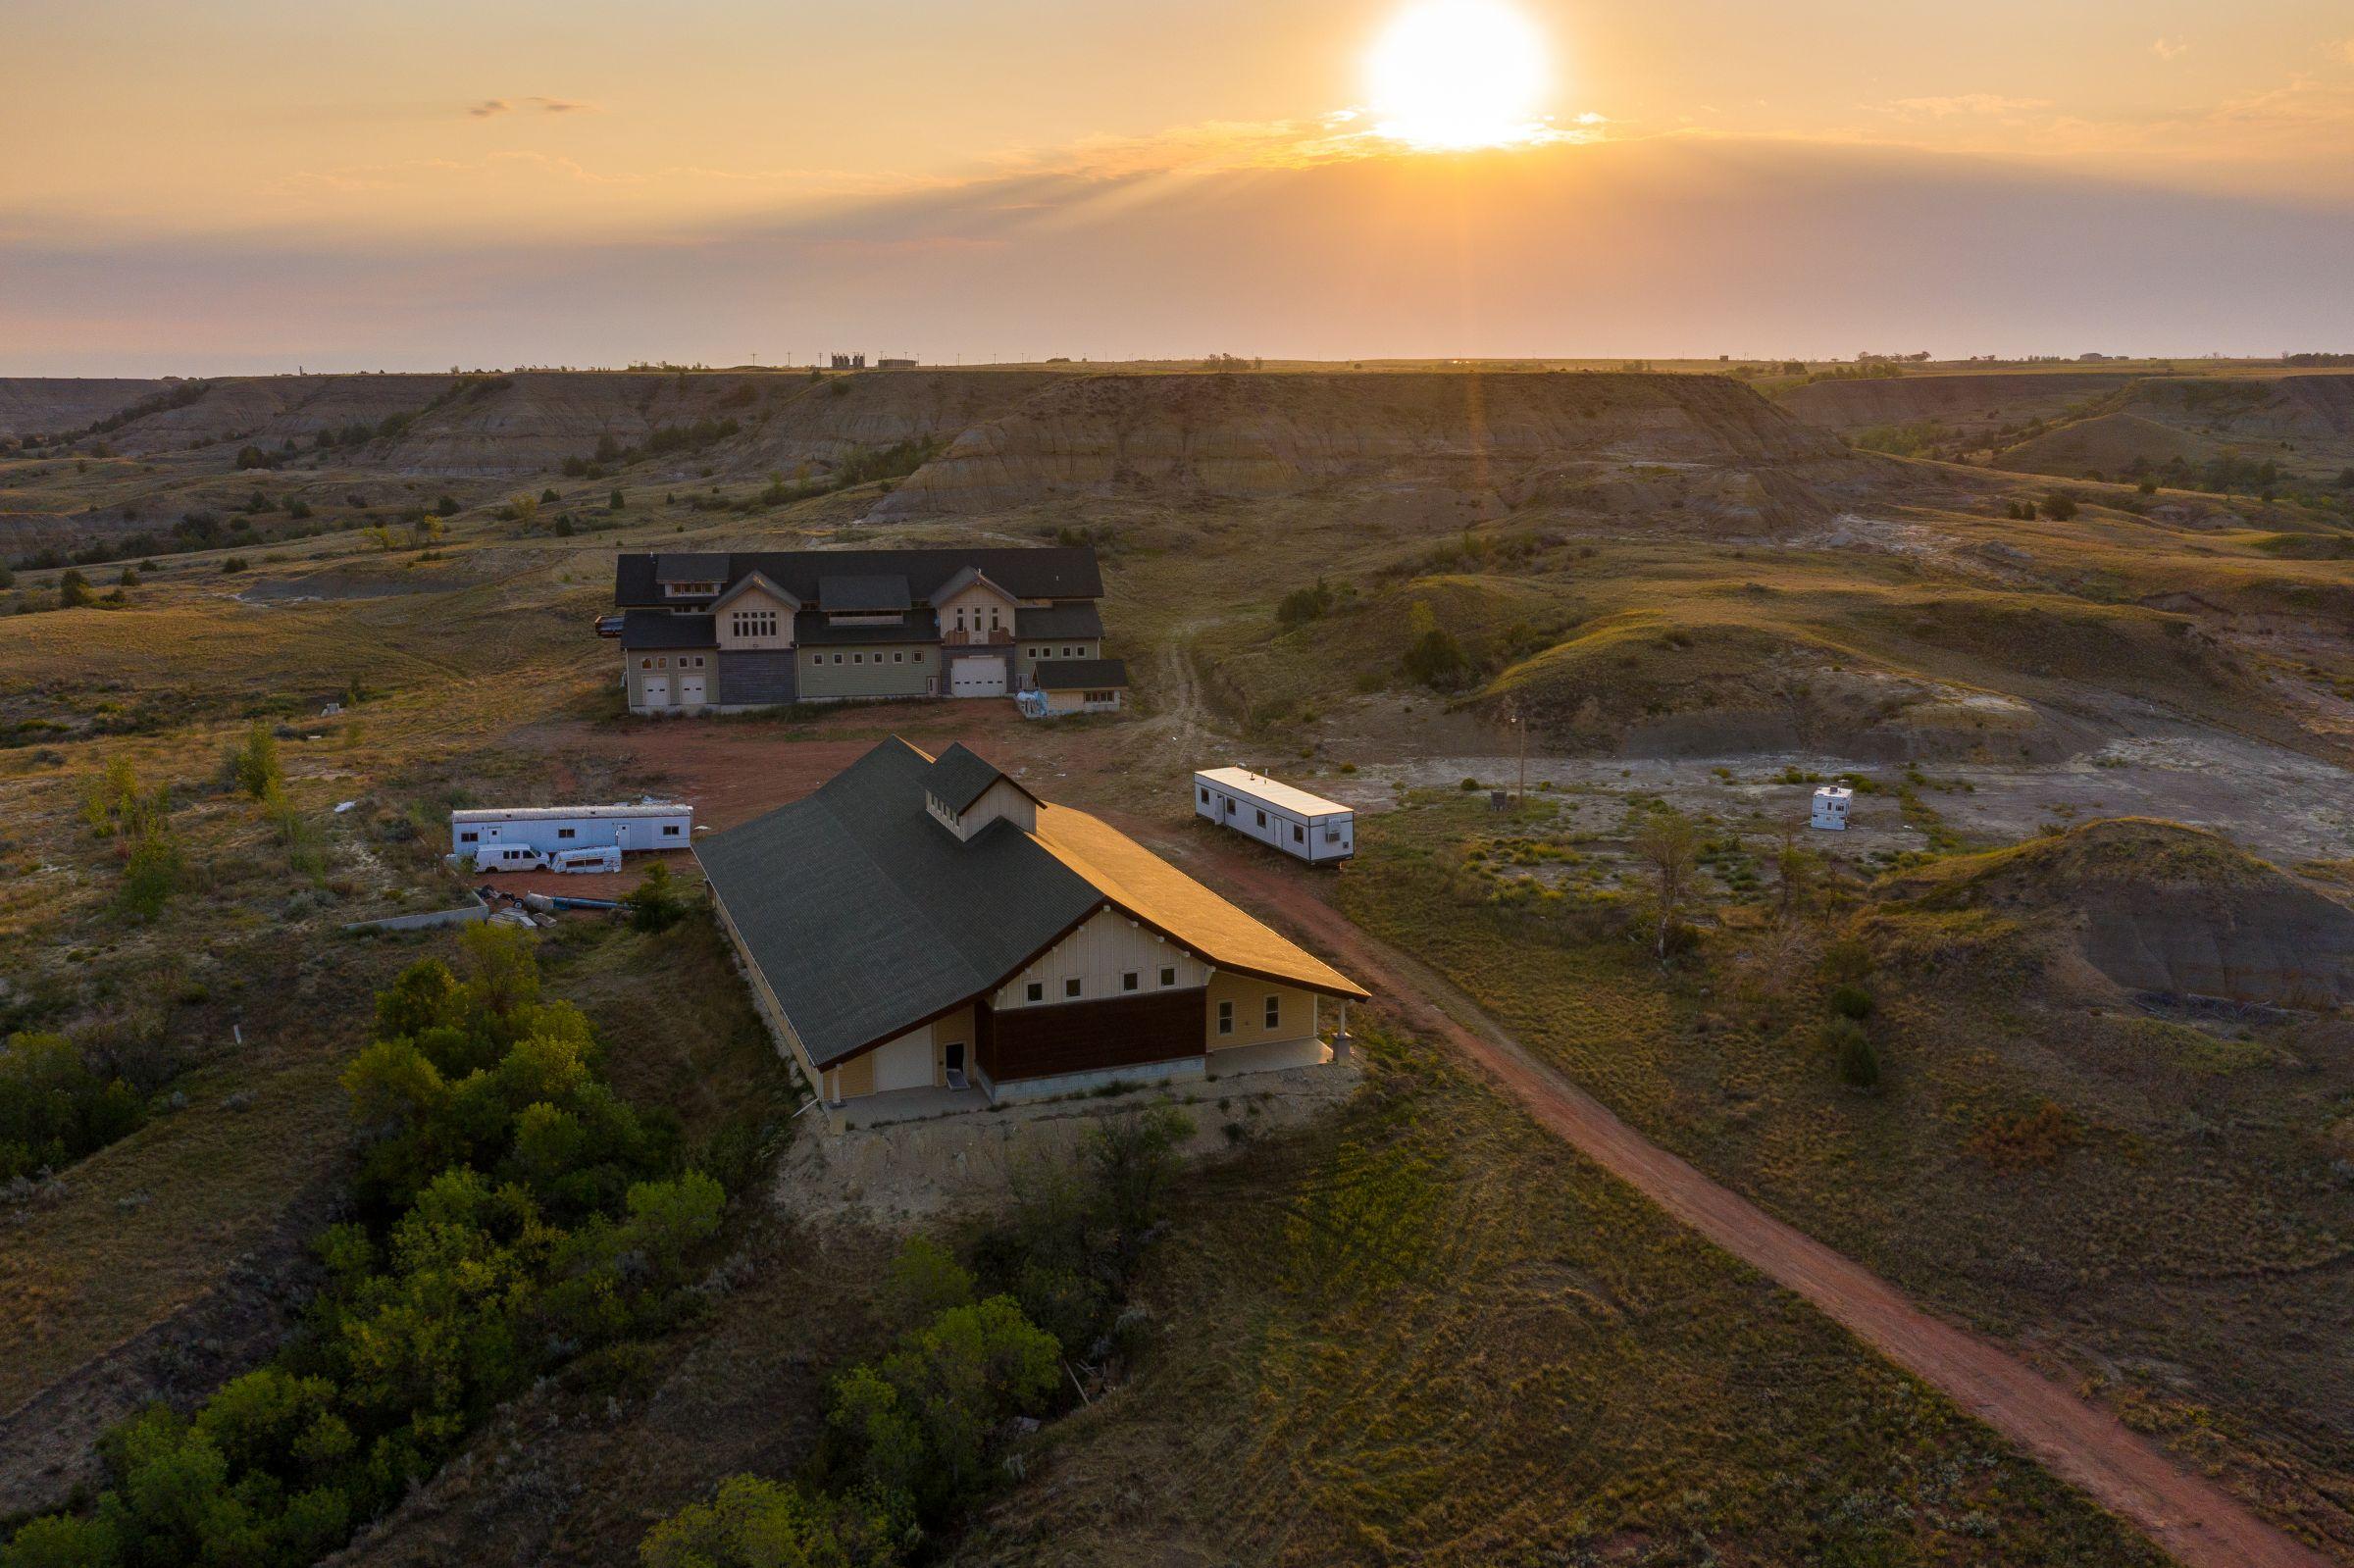 auctions-land-mckenzie-county-north-dakota-270-acres-listing-number-15735-0-2021-09-09-214352.jpeg